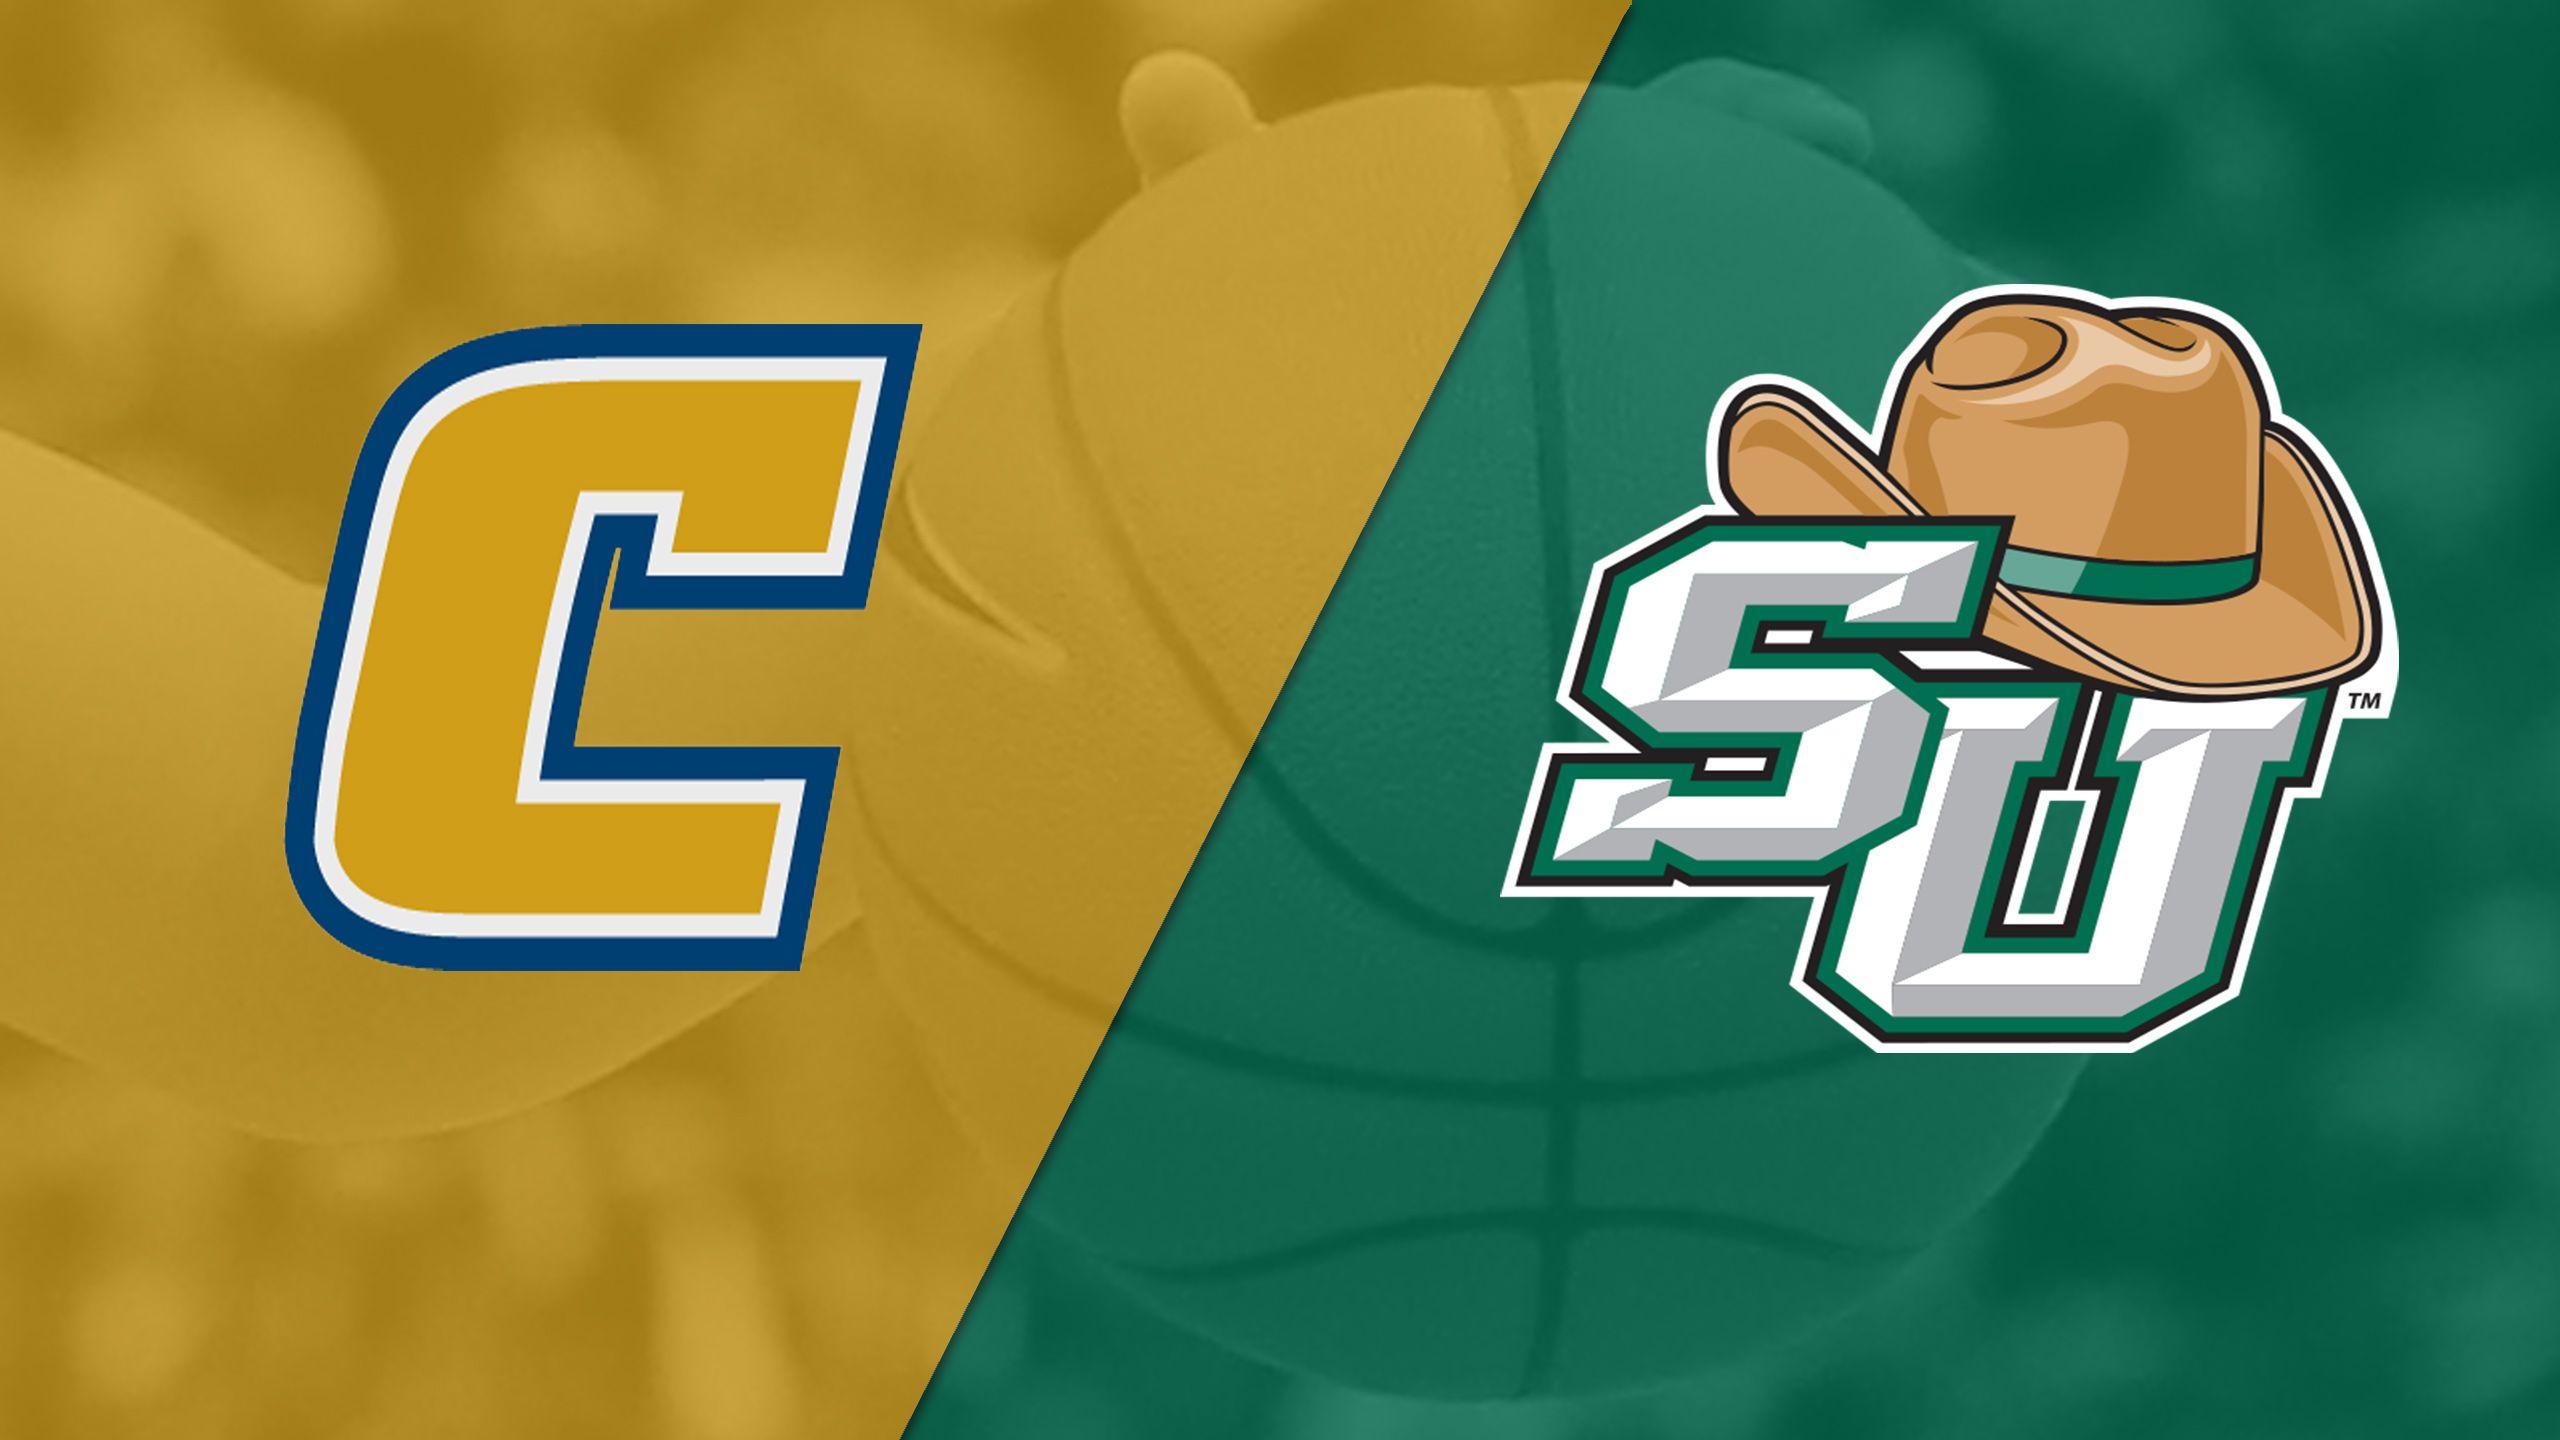 Chattanooga vs. Stetson (W Basketball)